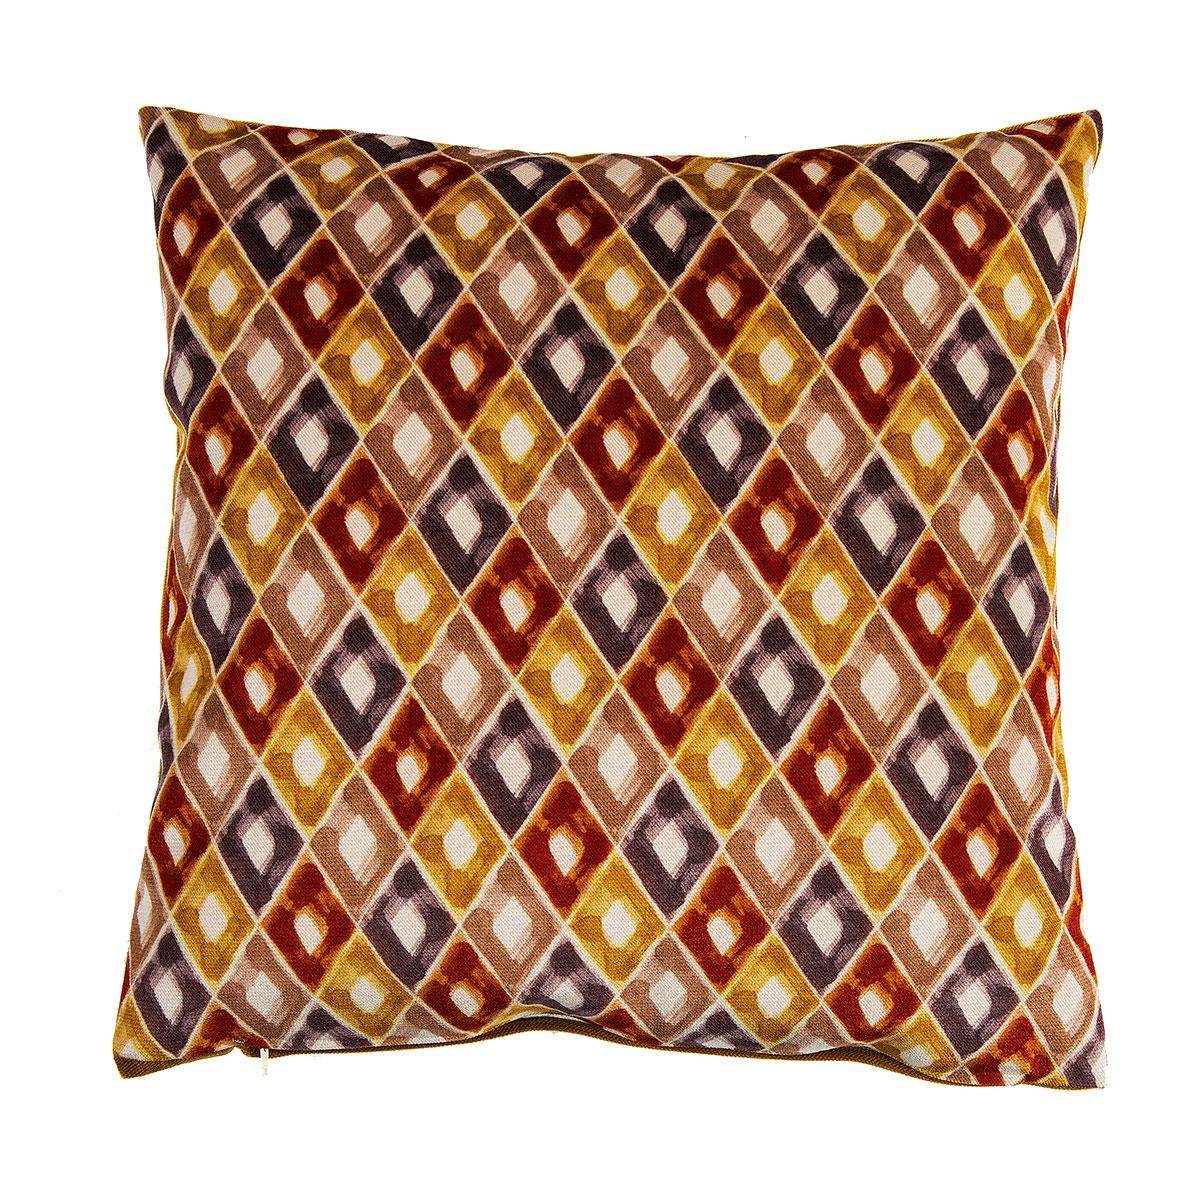 Belgium Velvet Cushion Covers Sw Living Home Textiles